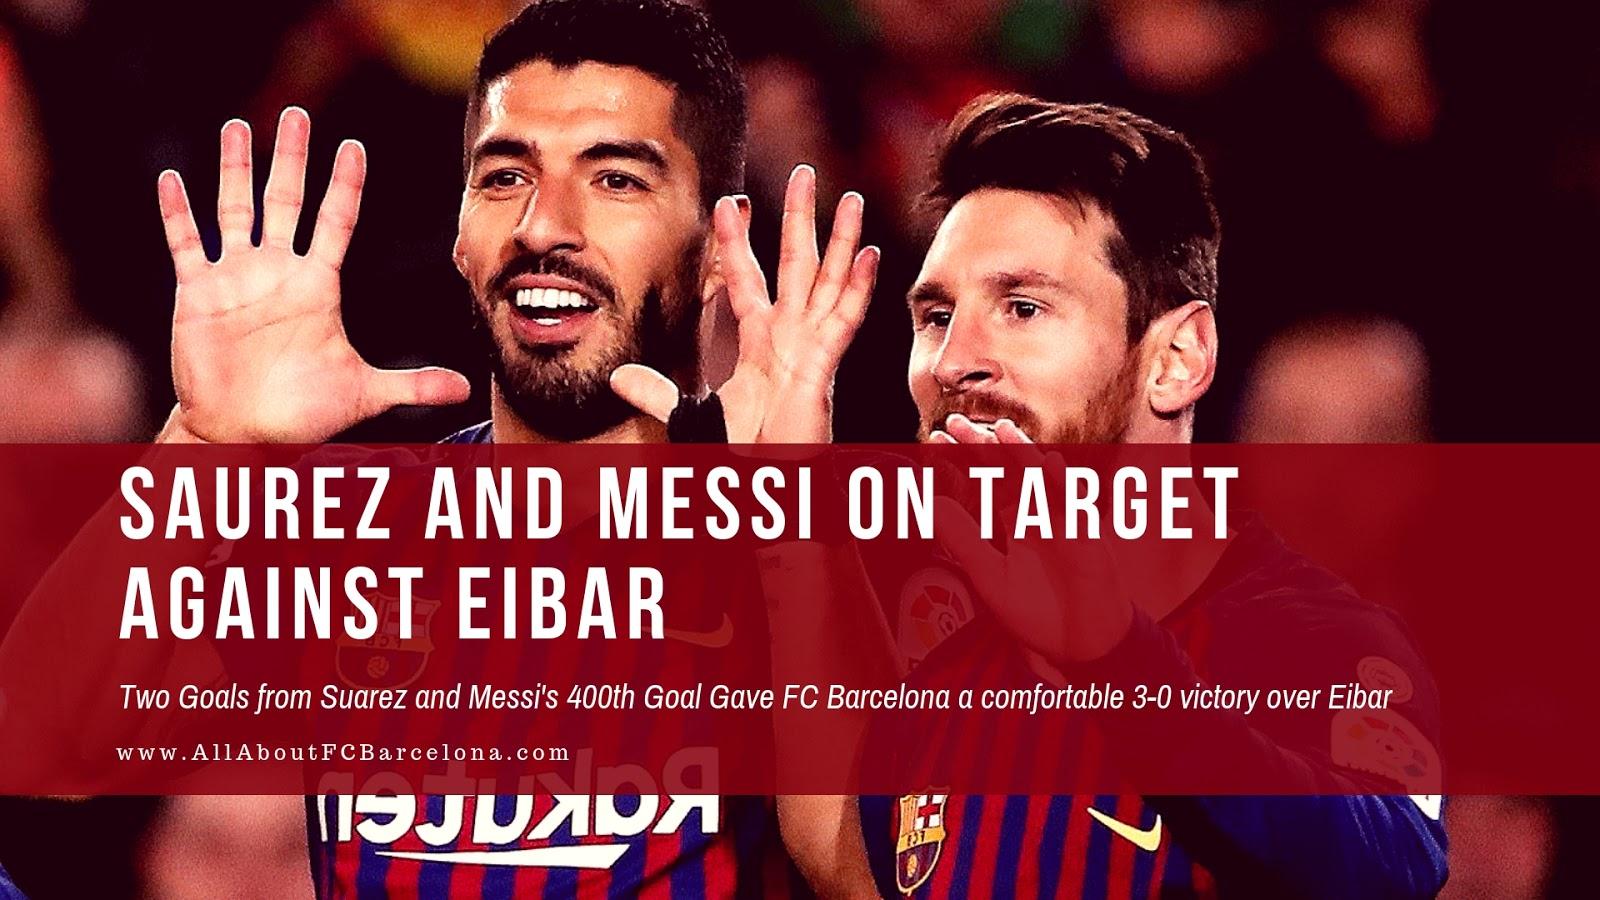 Luis Saurez scored twice and assisted Messi's 400th Goal in la Liga in Barca's 3-0 victory over Eibar #Barca #FCBarcelona #Messi #Saurez